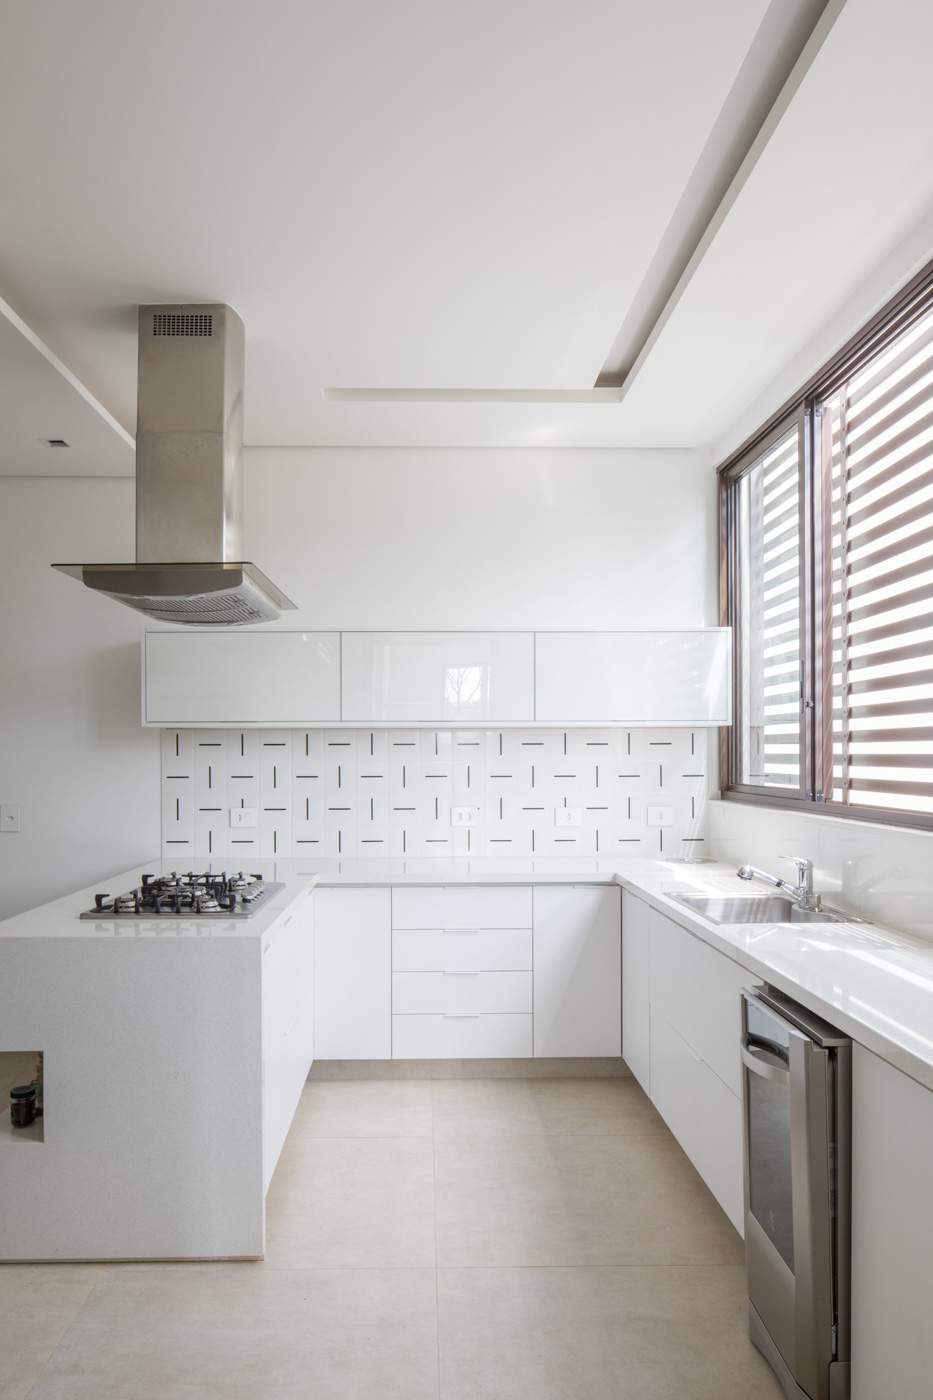 Mova-arquitetura-foto-haruo-mikami_B_258_Baixa.jpg